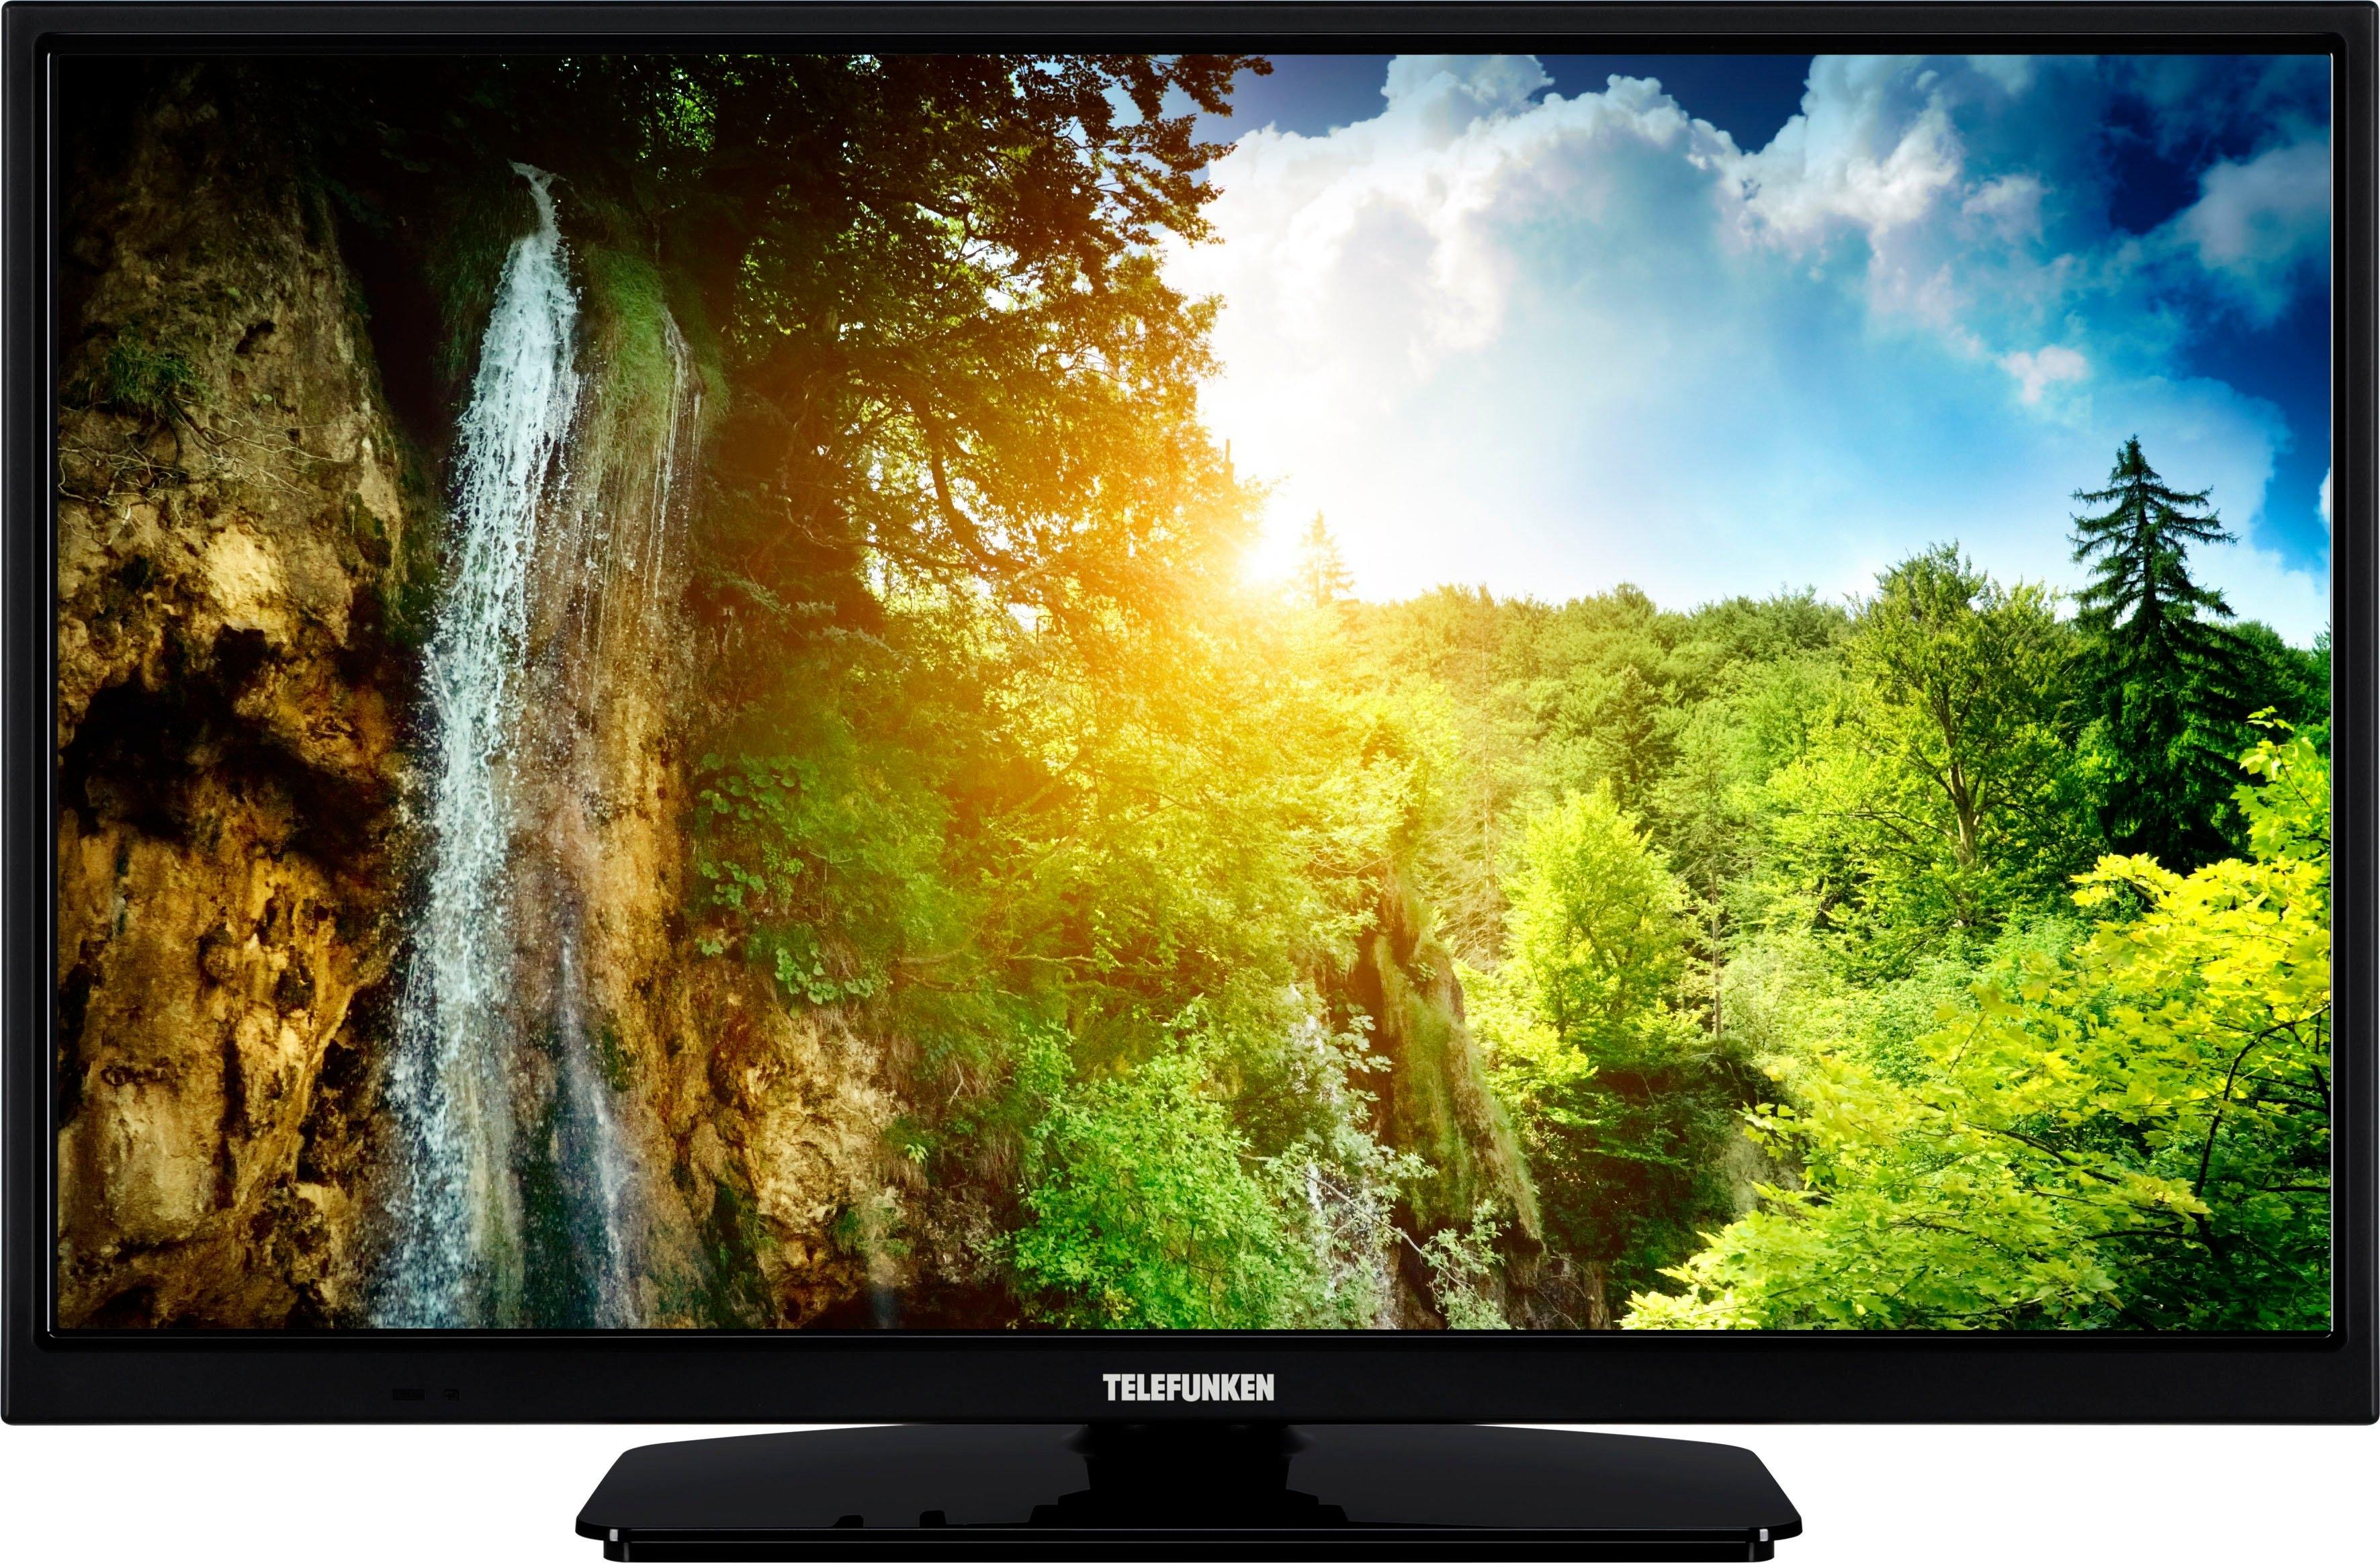 Telefunken LED-TV L24H554M1CW, 60 cm / 24